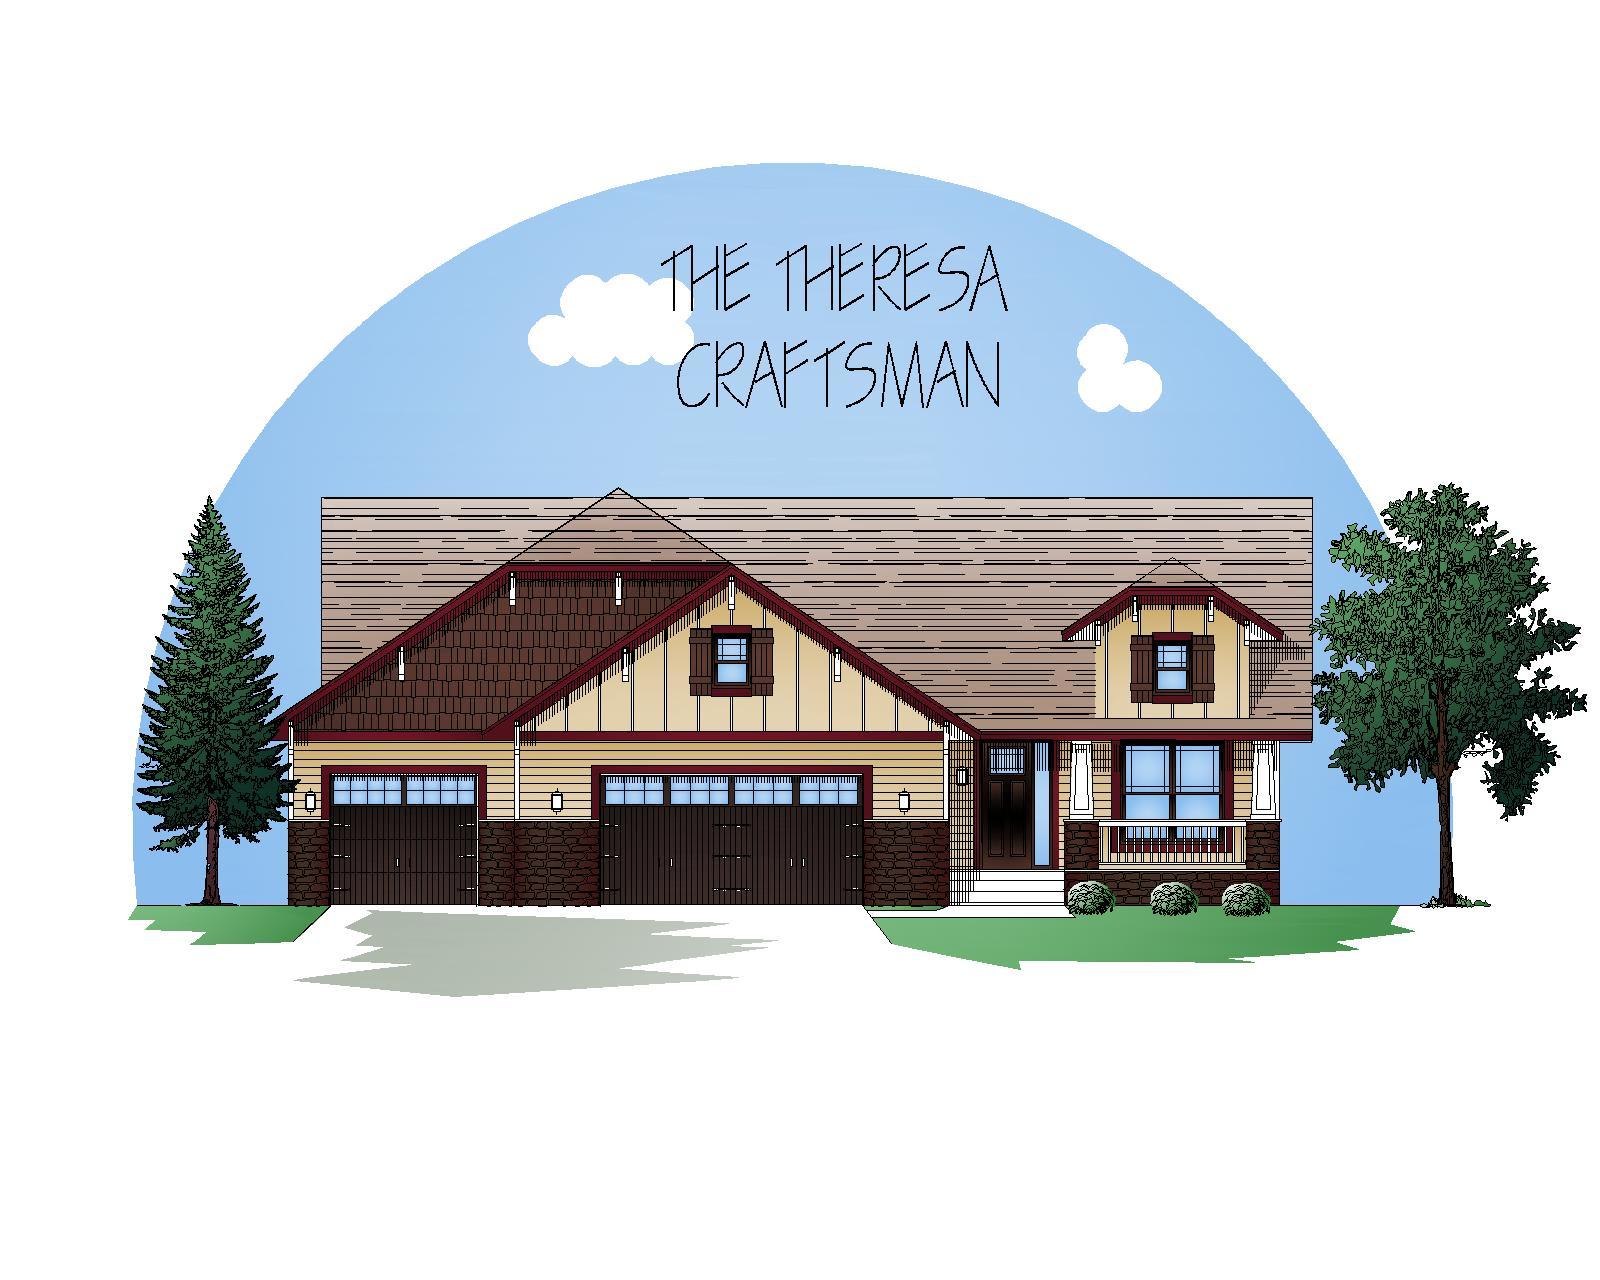 Craftsman Style Theresa